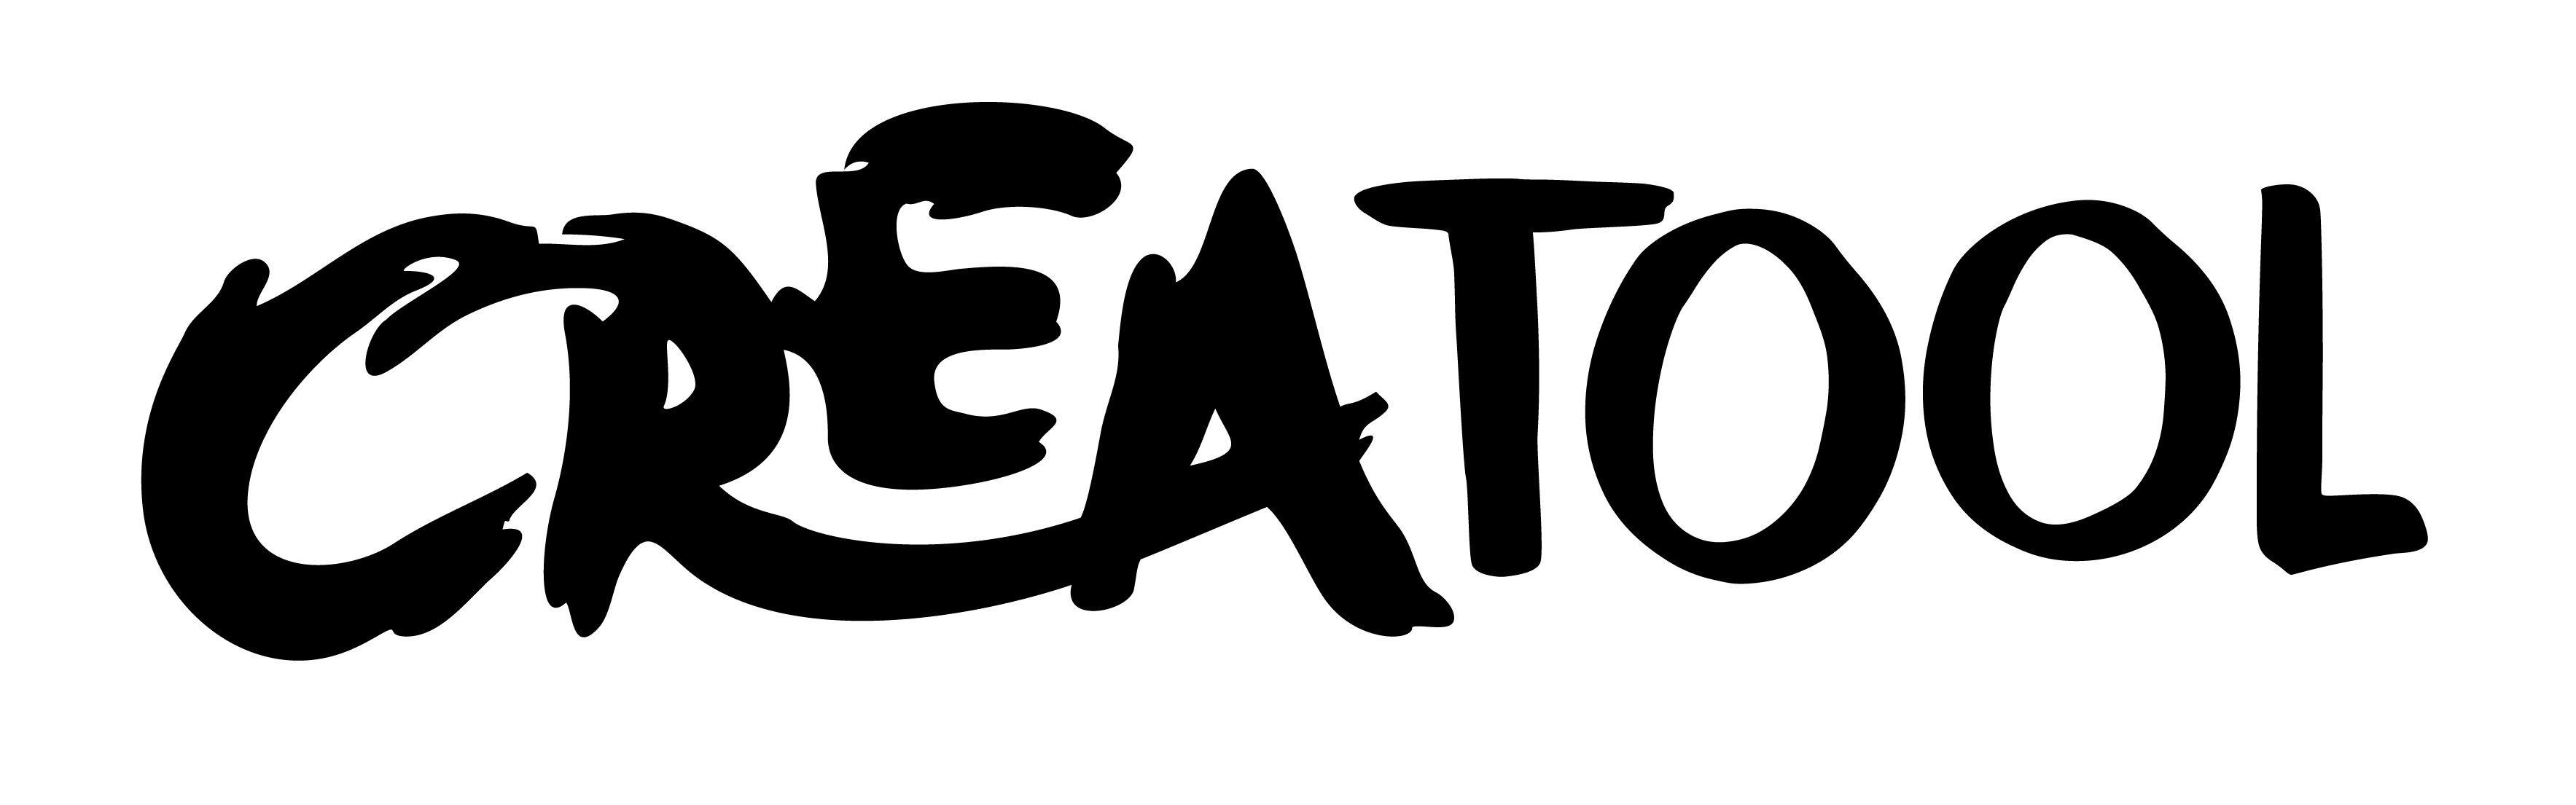 Creatool